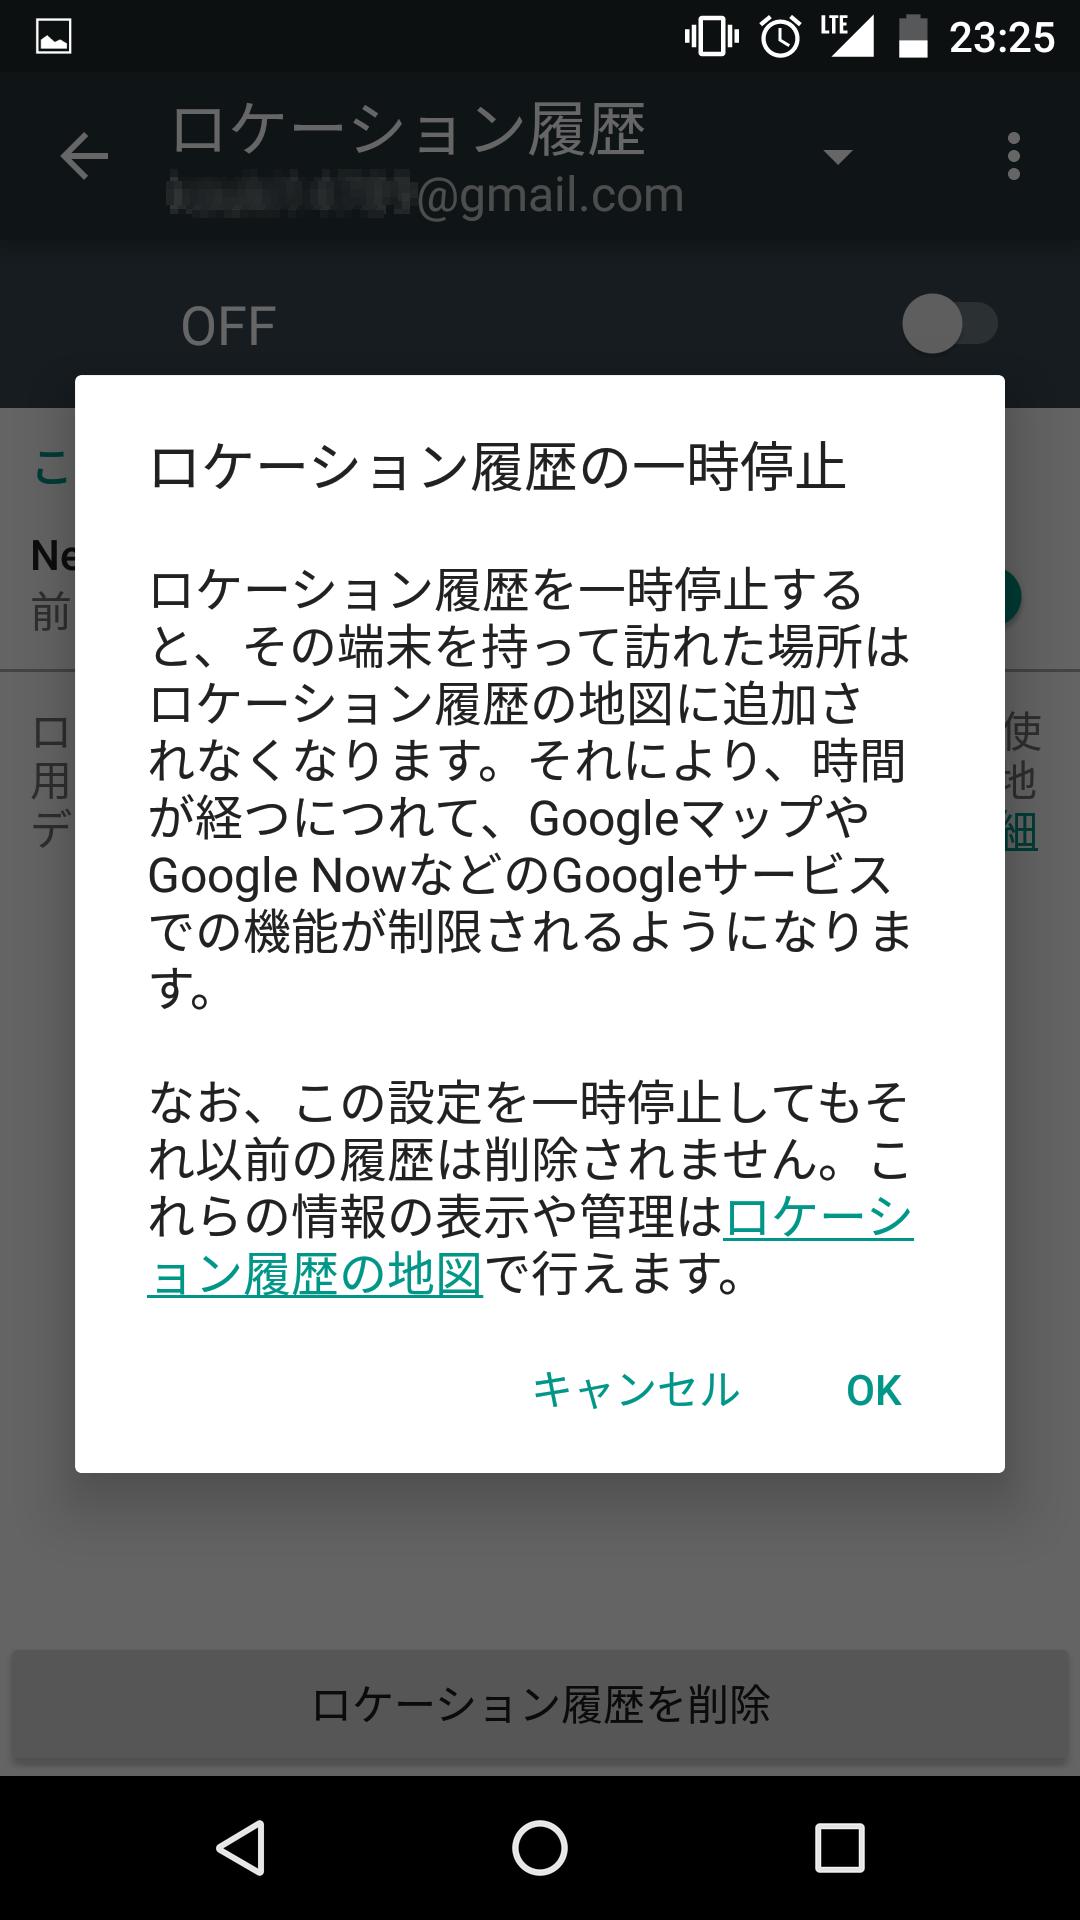 Screenshot_20160315-232525